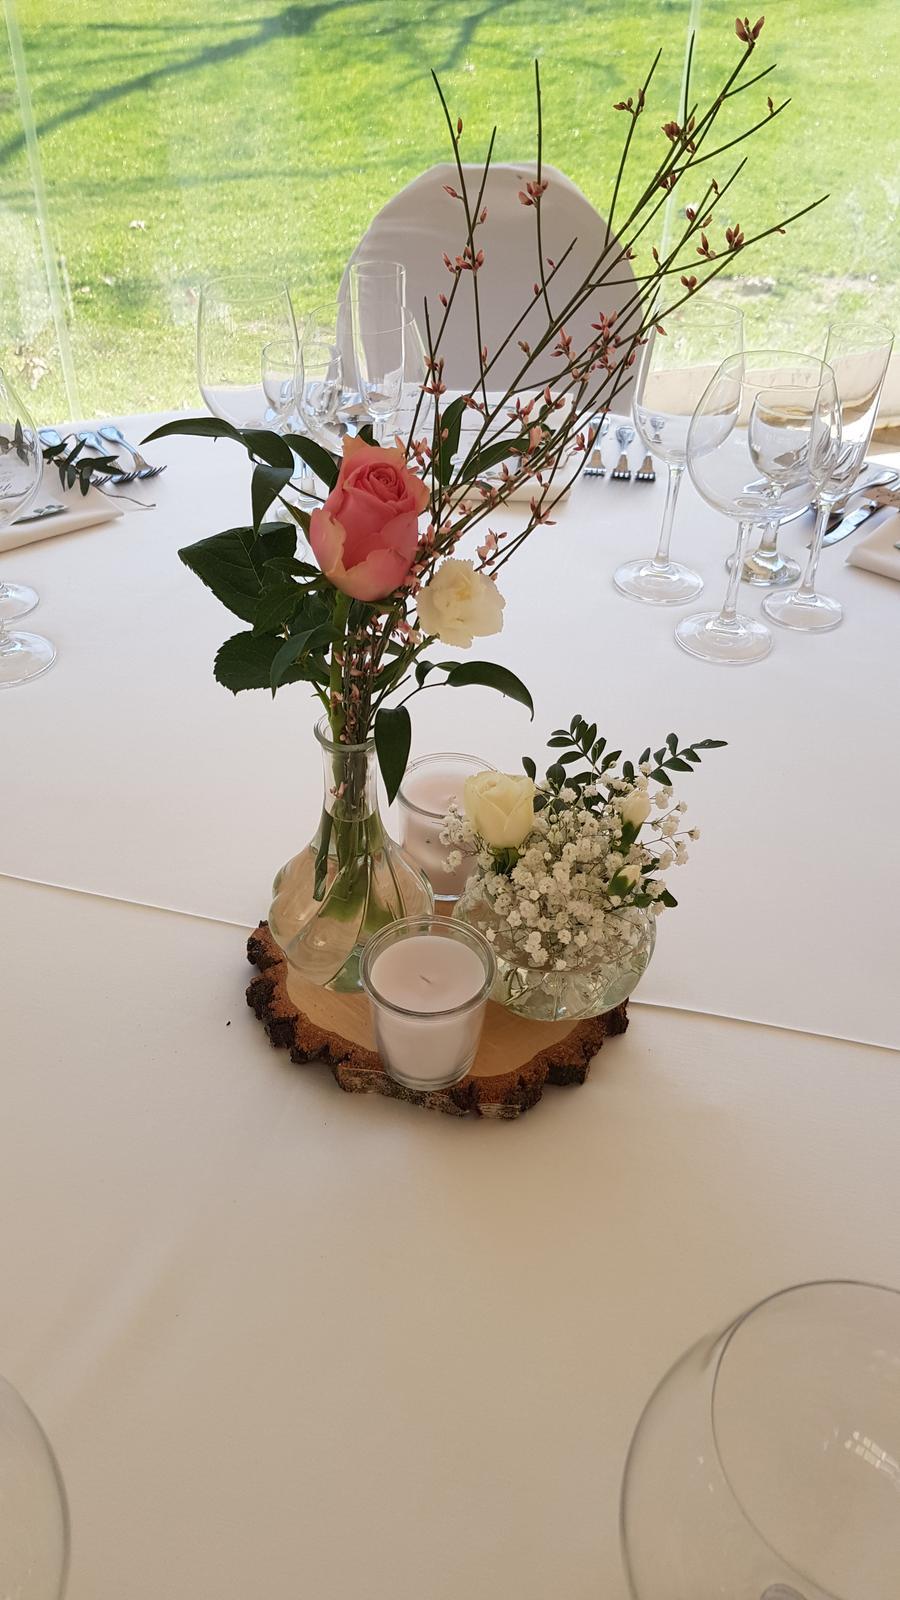 Svatební-kviti - Obrázek č. 6